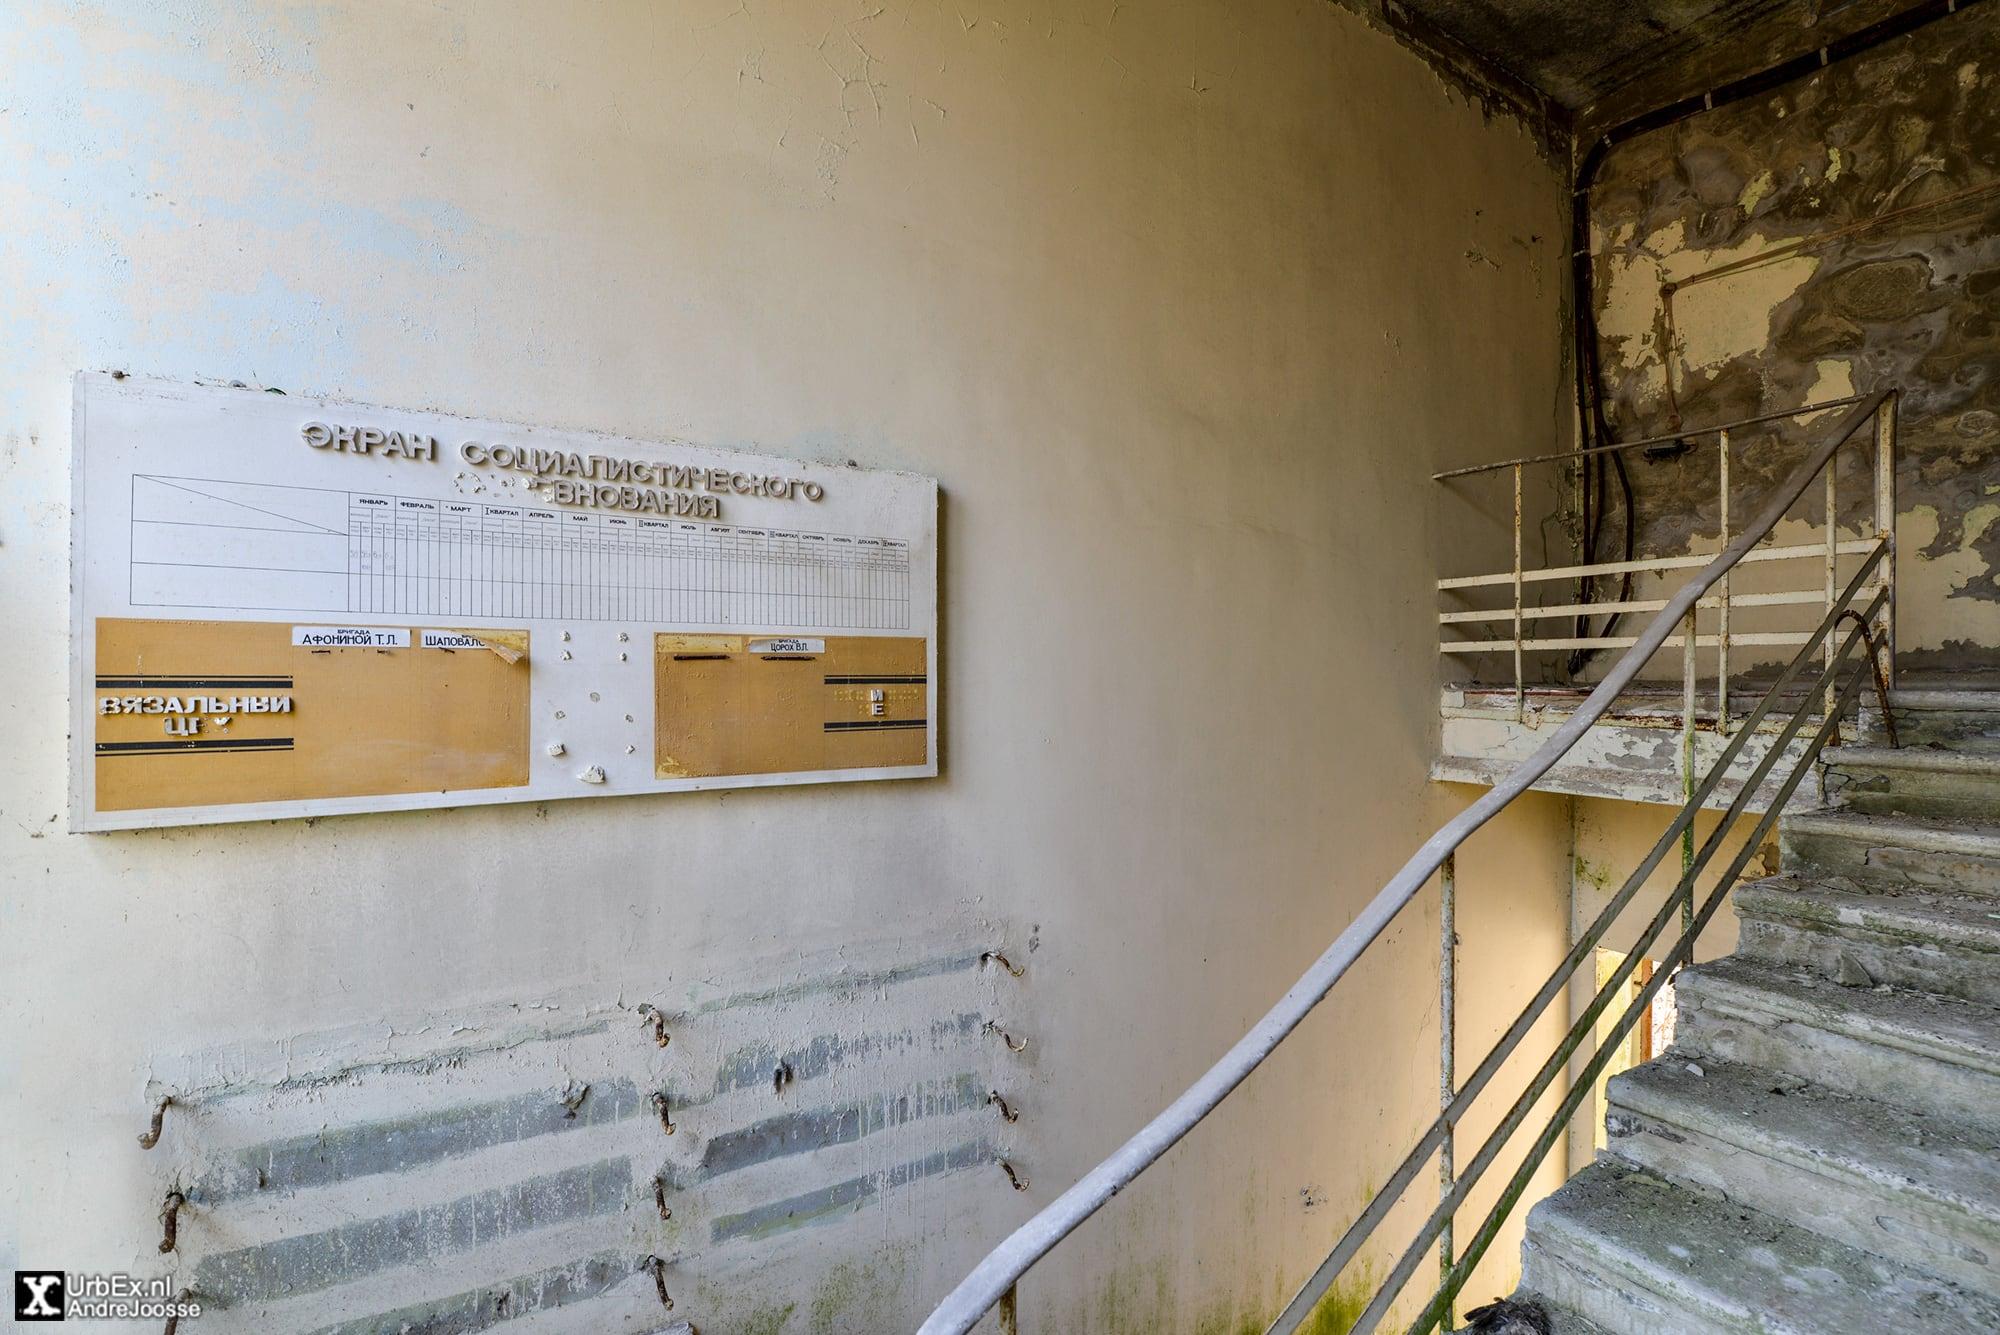 The КБО building Pripyat Retail